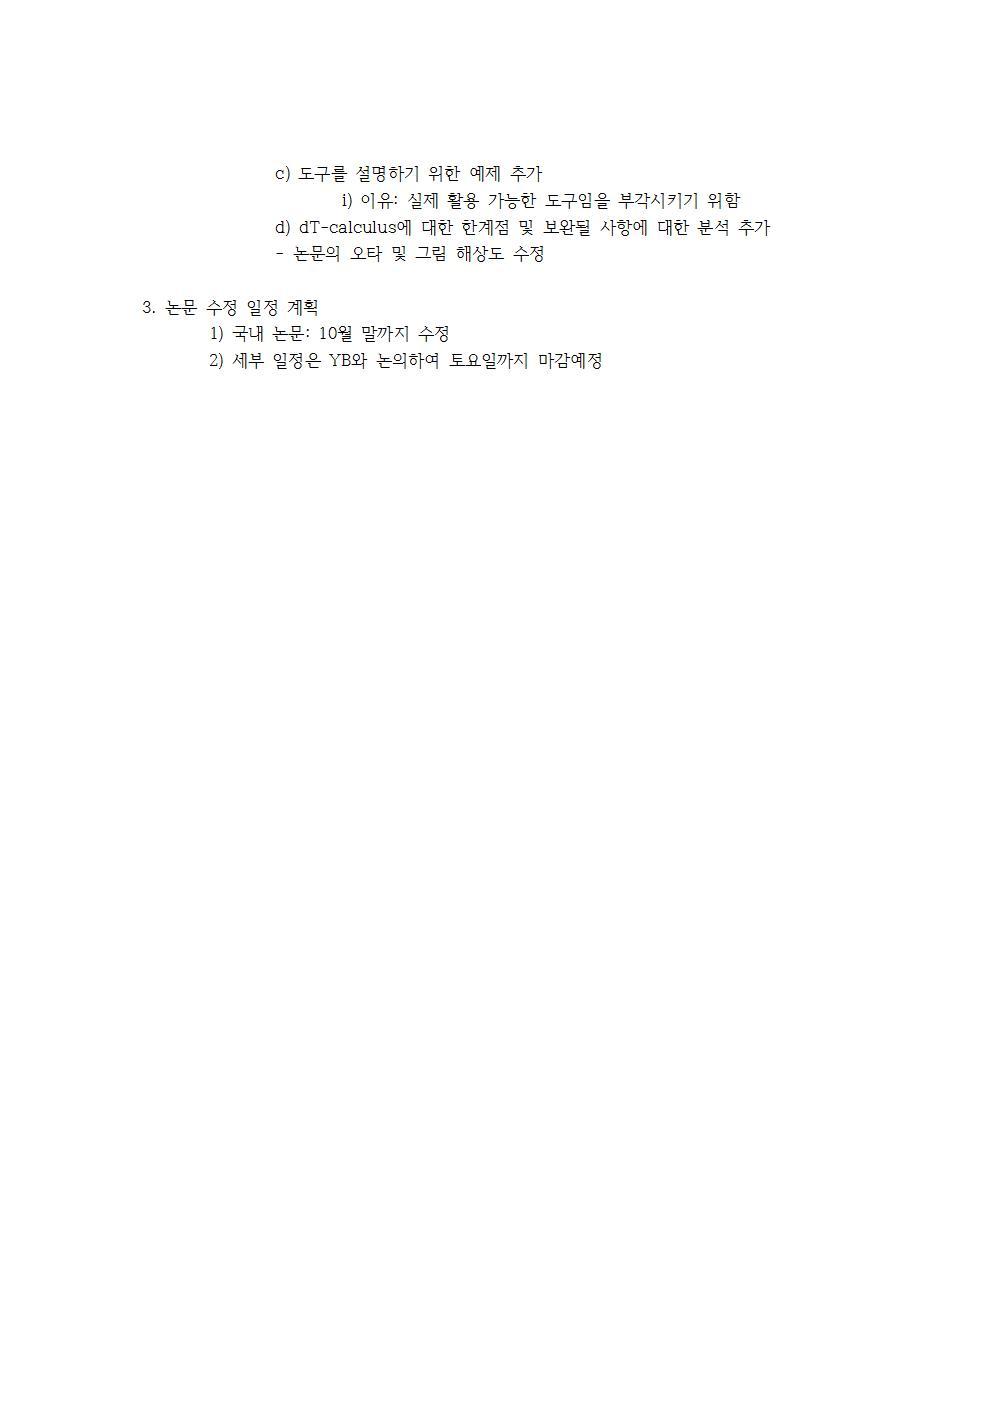 D-[17-084-PP-13]-[KIISE2017-dT-calculus 논문 수정]-[SH]-[2017-09-14]004.jpg